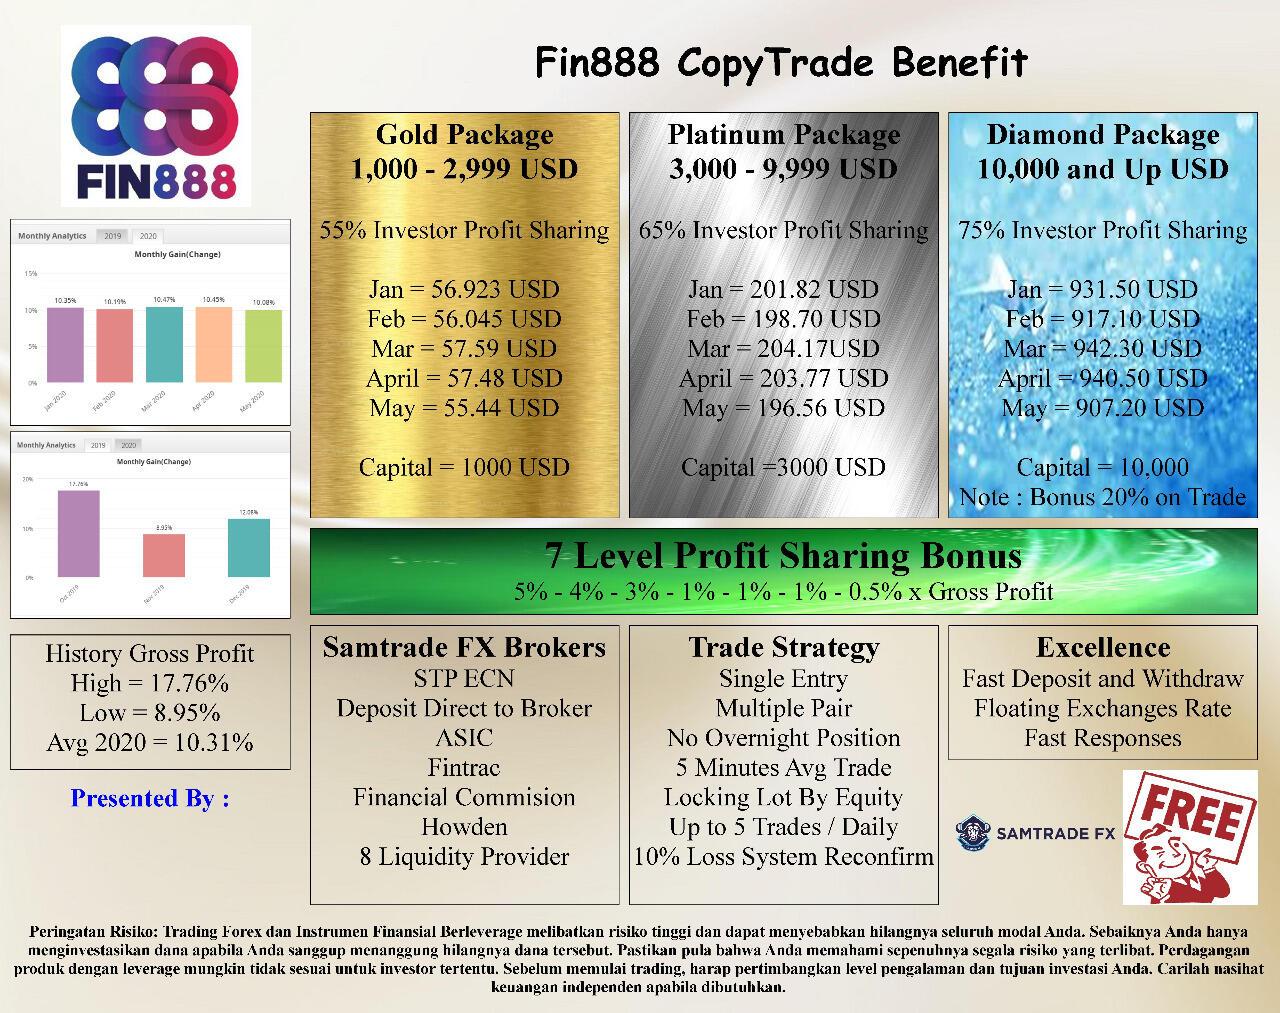 Trading Forex menjadi sangat mudah bersama kami